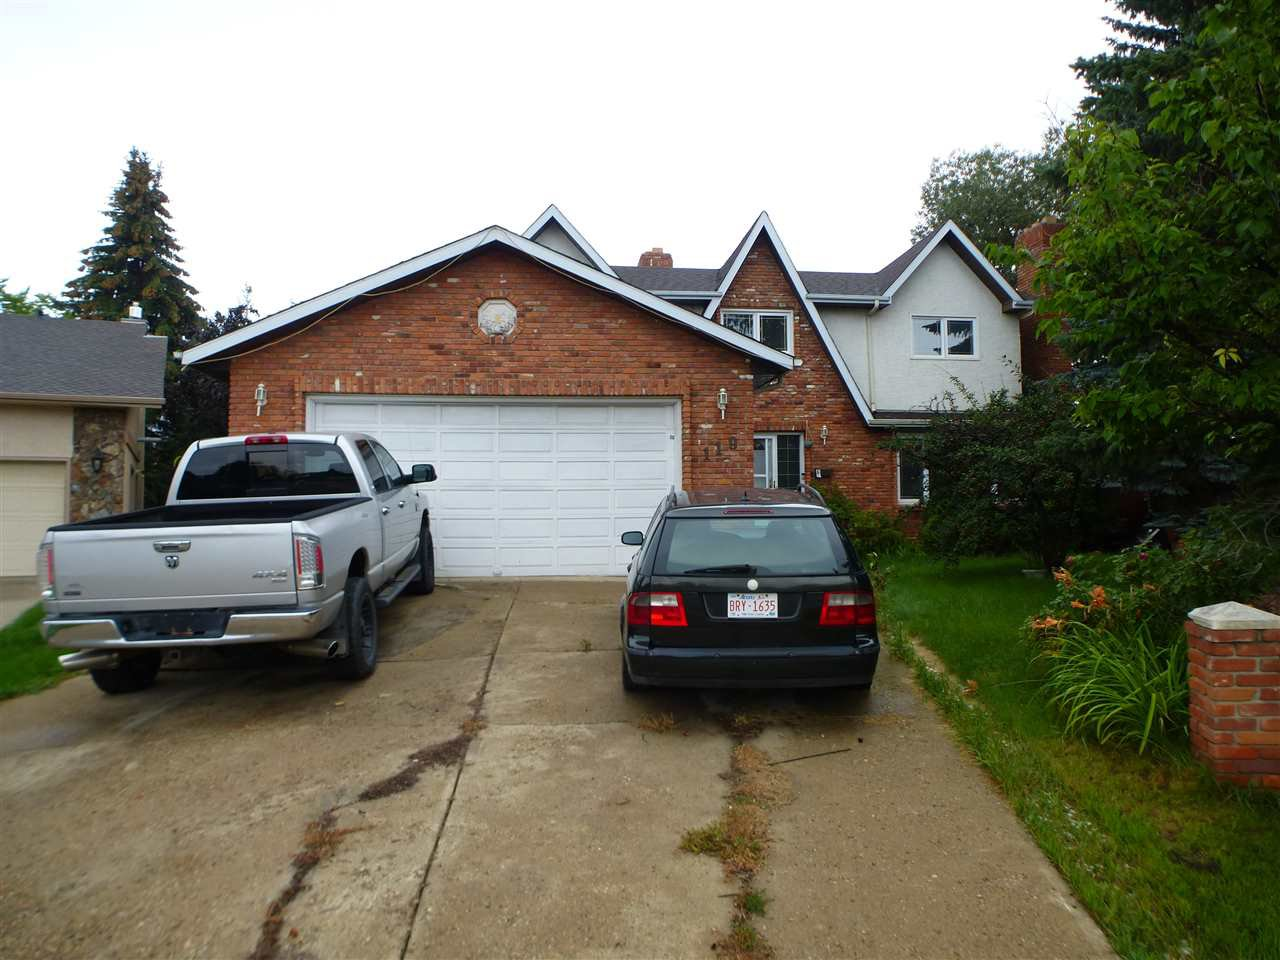 Main Photo: 119 GRAND MEADOW Crescent in Edmonton: Zone 29 House for sale : MLS®# E4171321